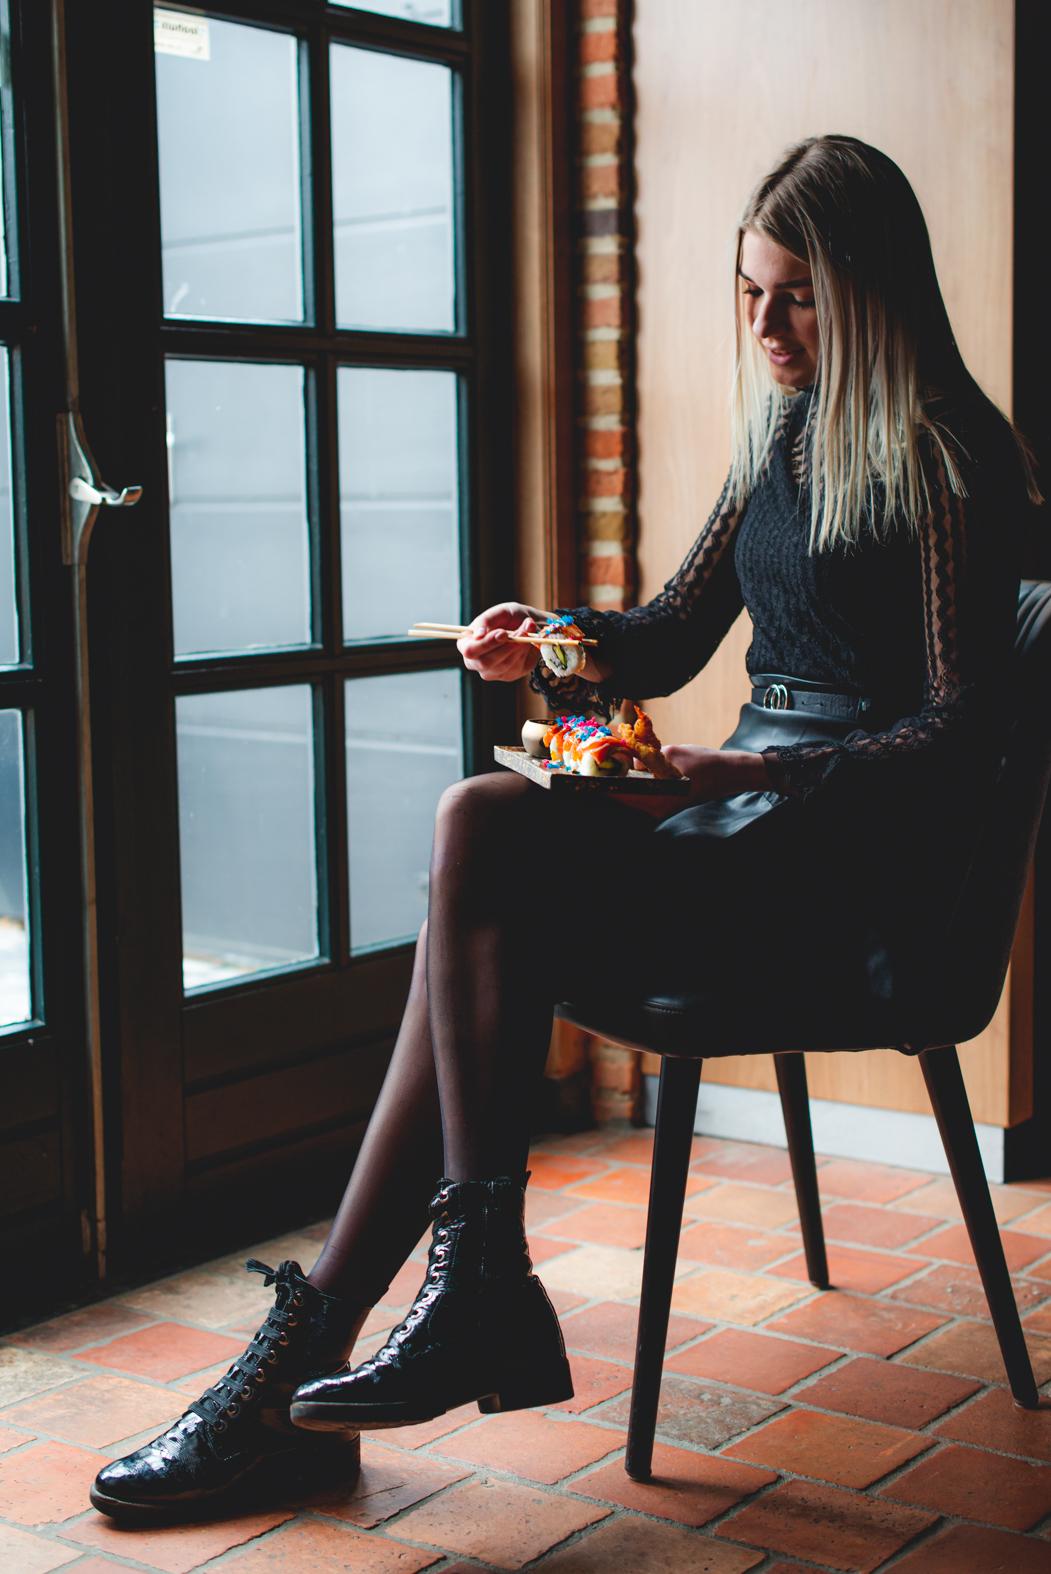 Bistro de Kruidentuin - Stefanie Spoelder roodfotografie - Food Photography